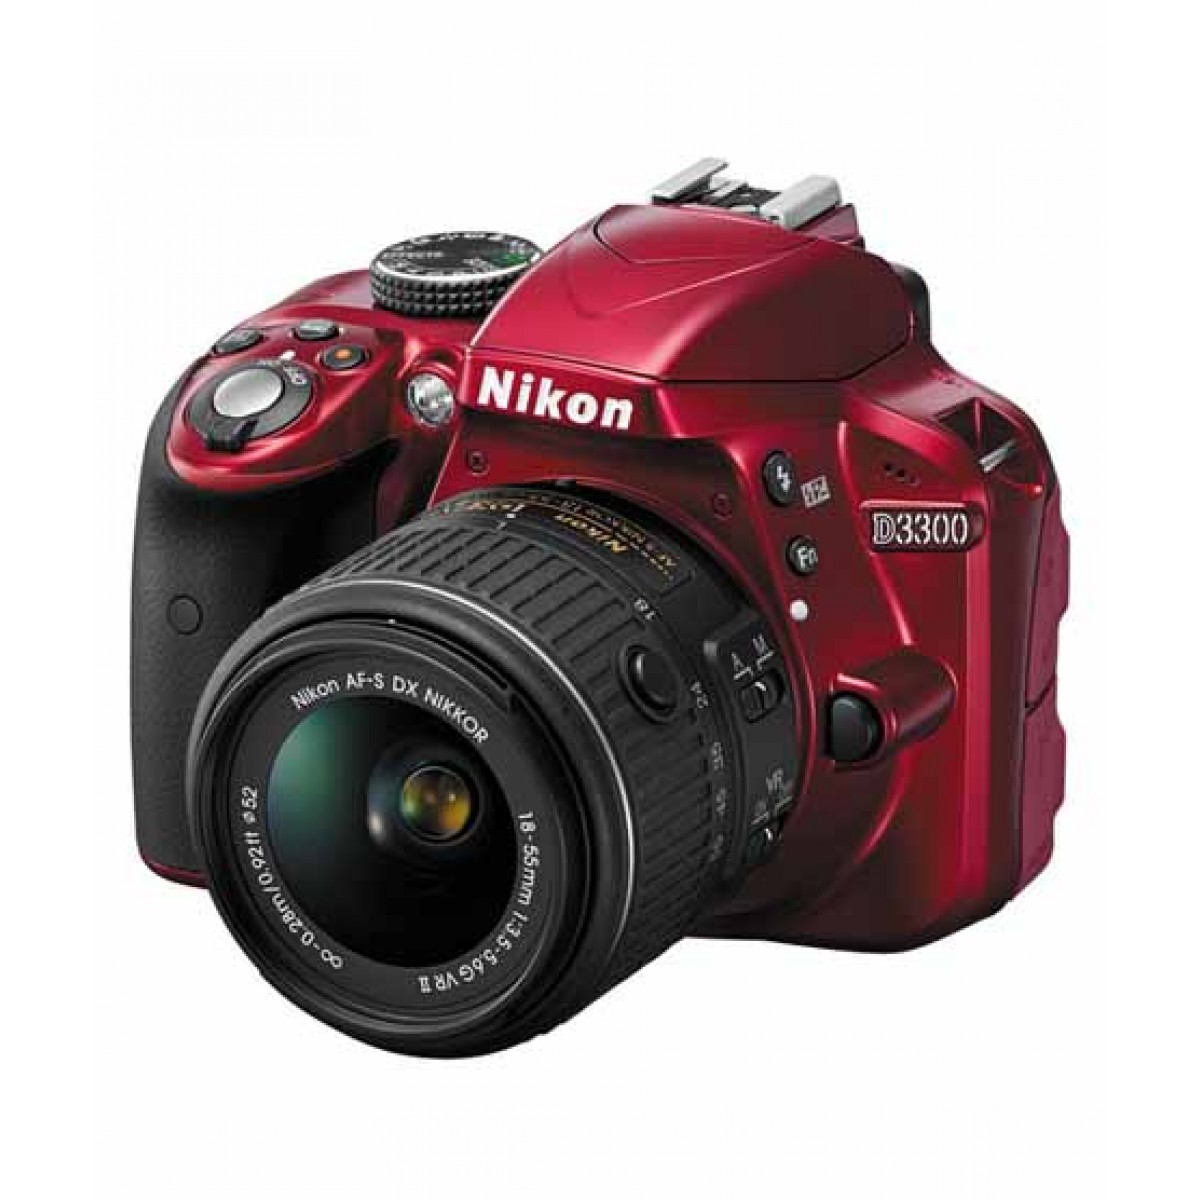 Nikon D3300 DSLR Camera with 18-55mm NVR Lens Red